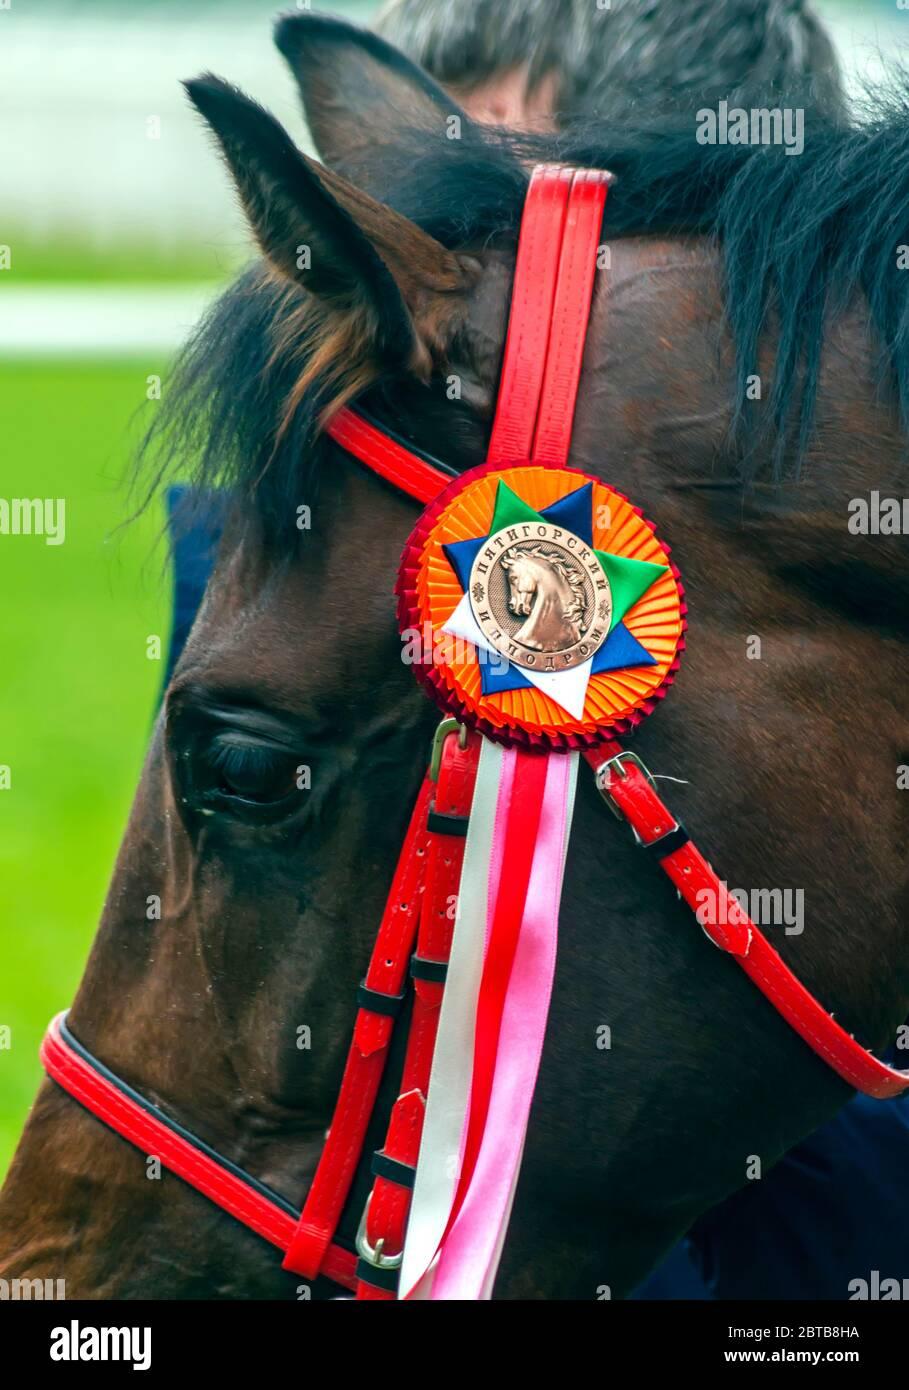 PYATIGORSK,RUSSIA - MAY 24,2020:Prize winner in honor of the Pavlovsky Hippodrome - red thoroughbred stallion Hoppner.On the rosette there is an inscr Stock Photo